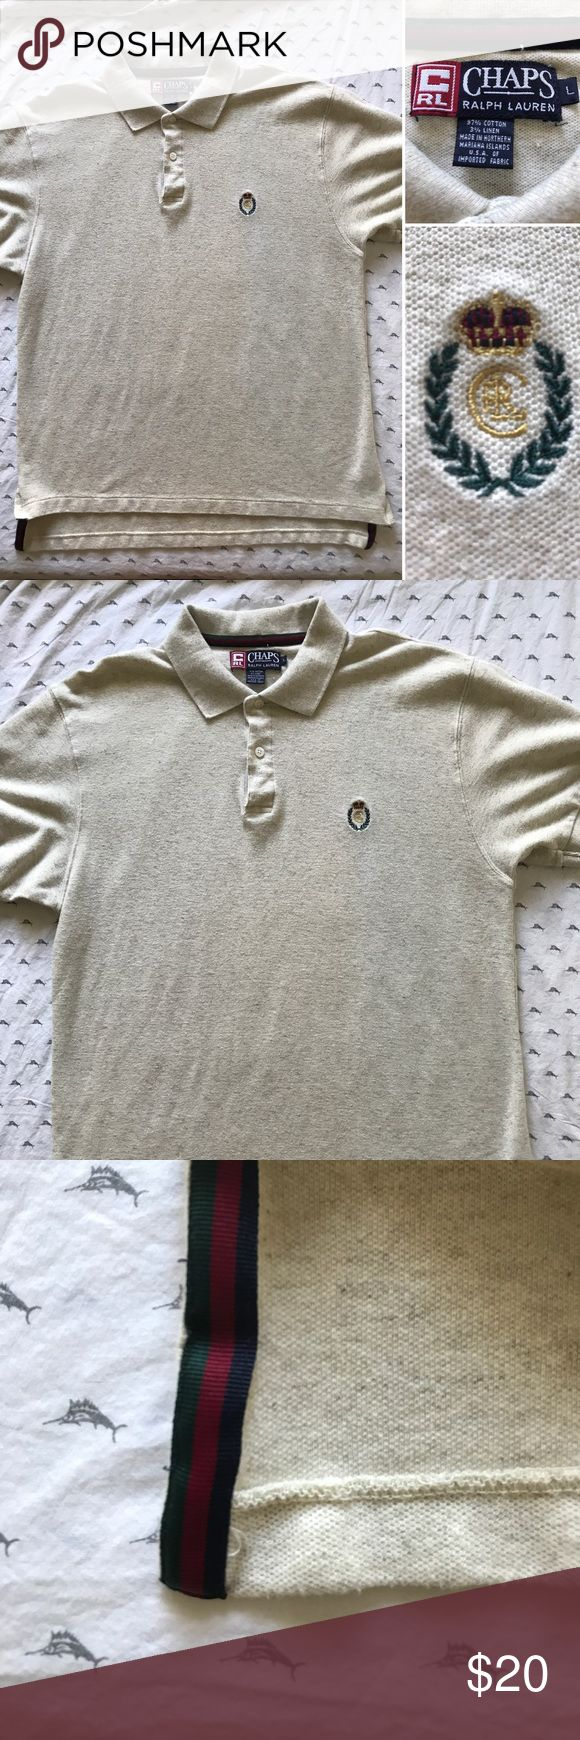 1bd0df7e56f5d ralph lauren clothing for women vest chaps by ralph lauren mens shirts